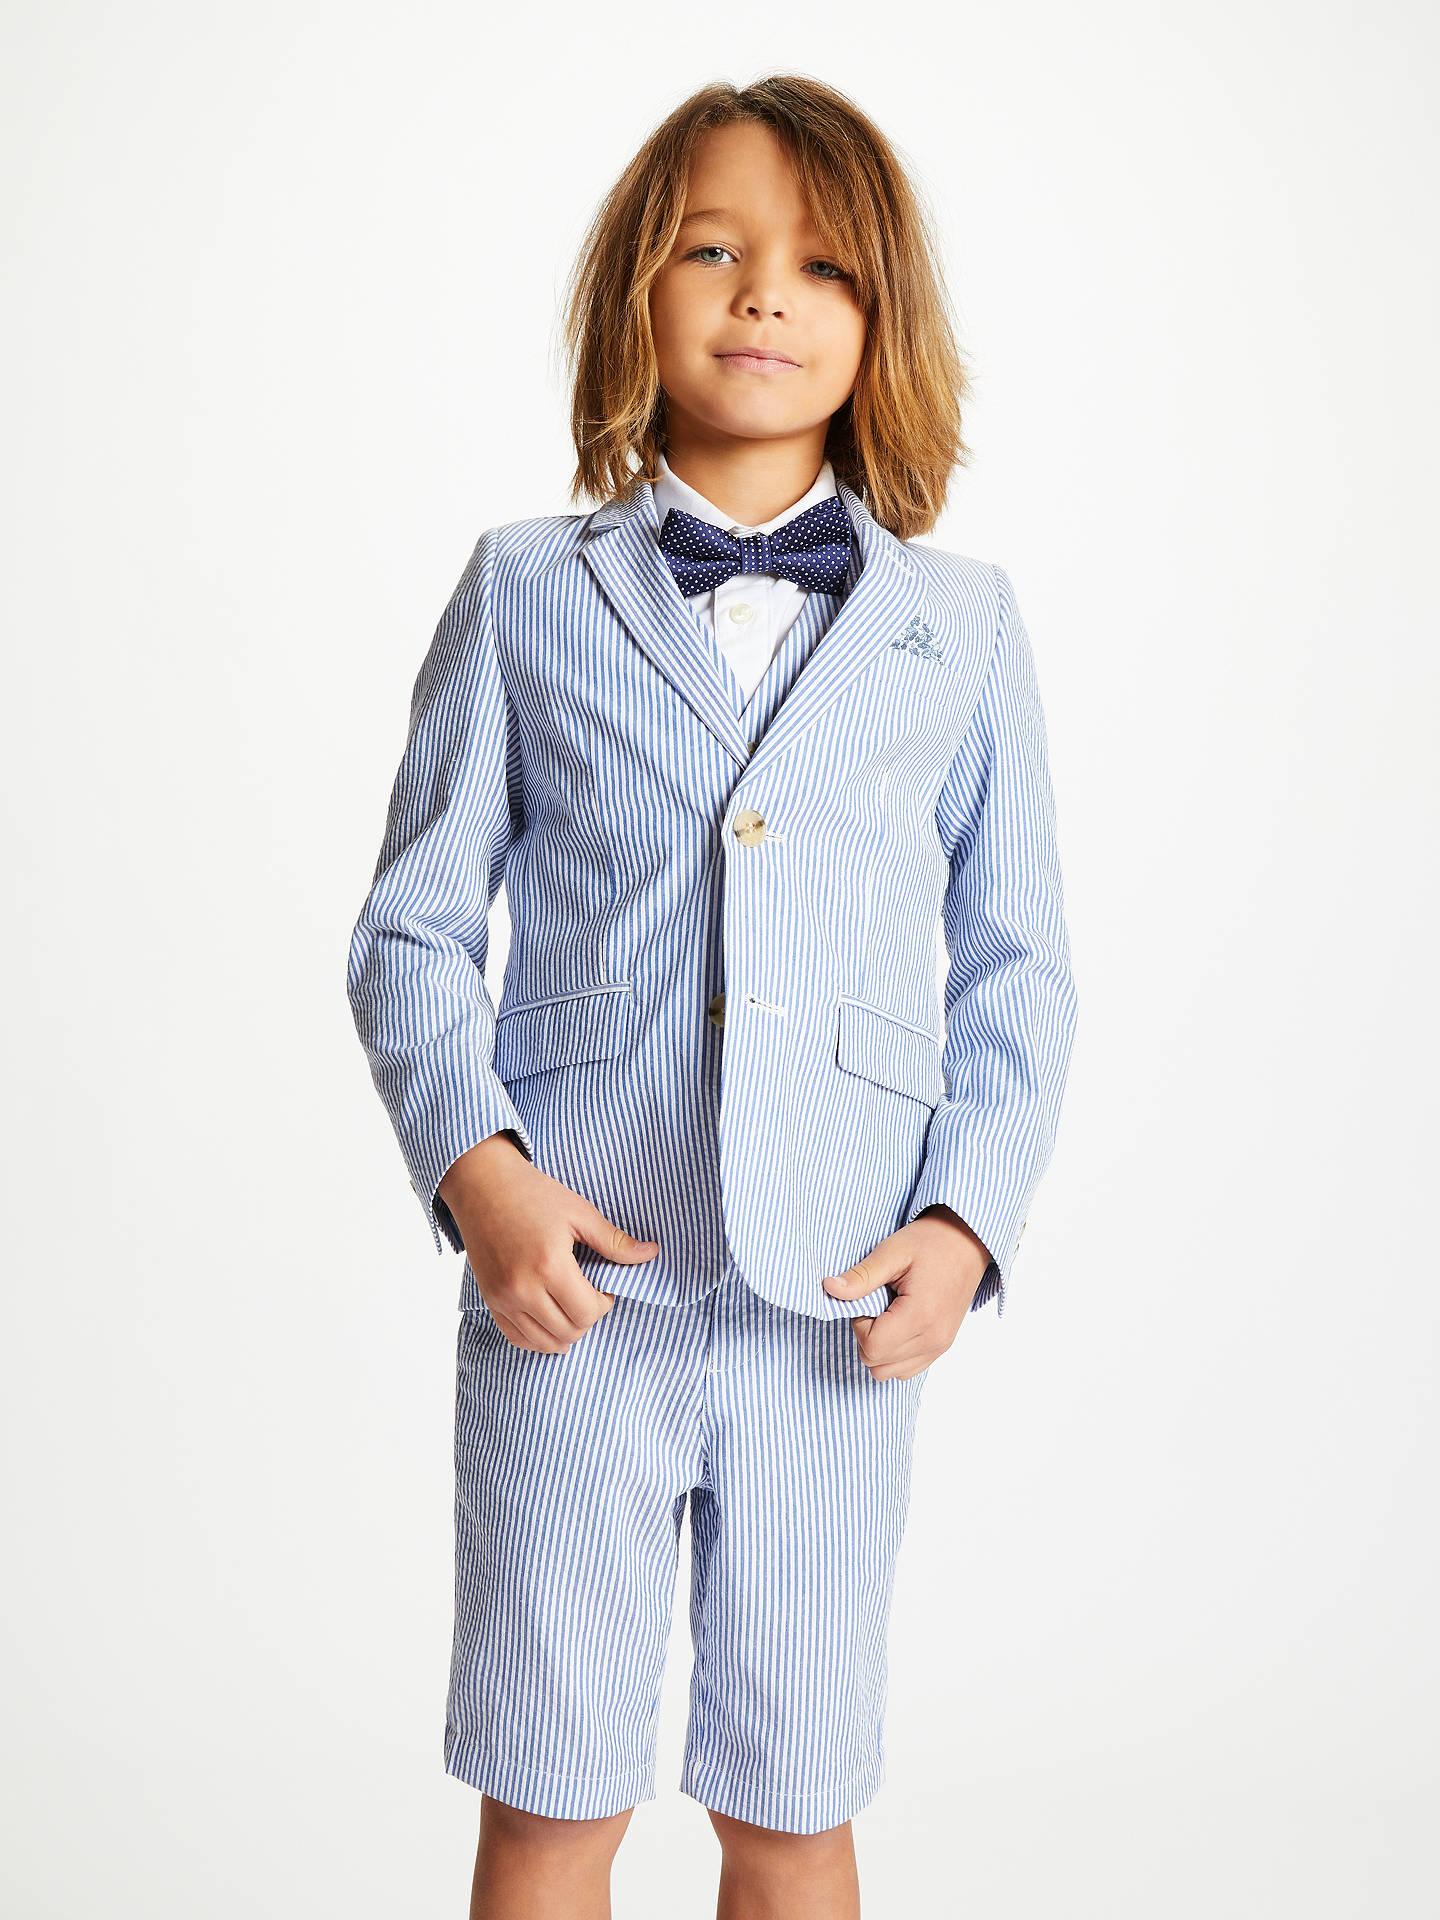 6dab1fb4a6c3 ... Buy John Lewis & Partners Heirloom Collection Boys' Striped Seersucker Suit  Jacket, Navy/ ...